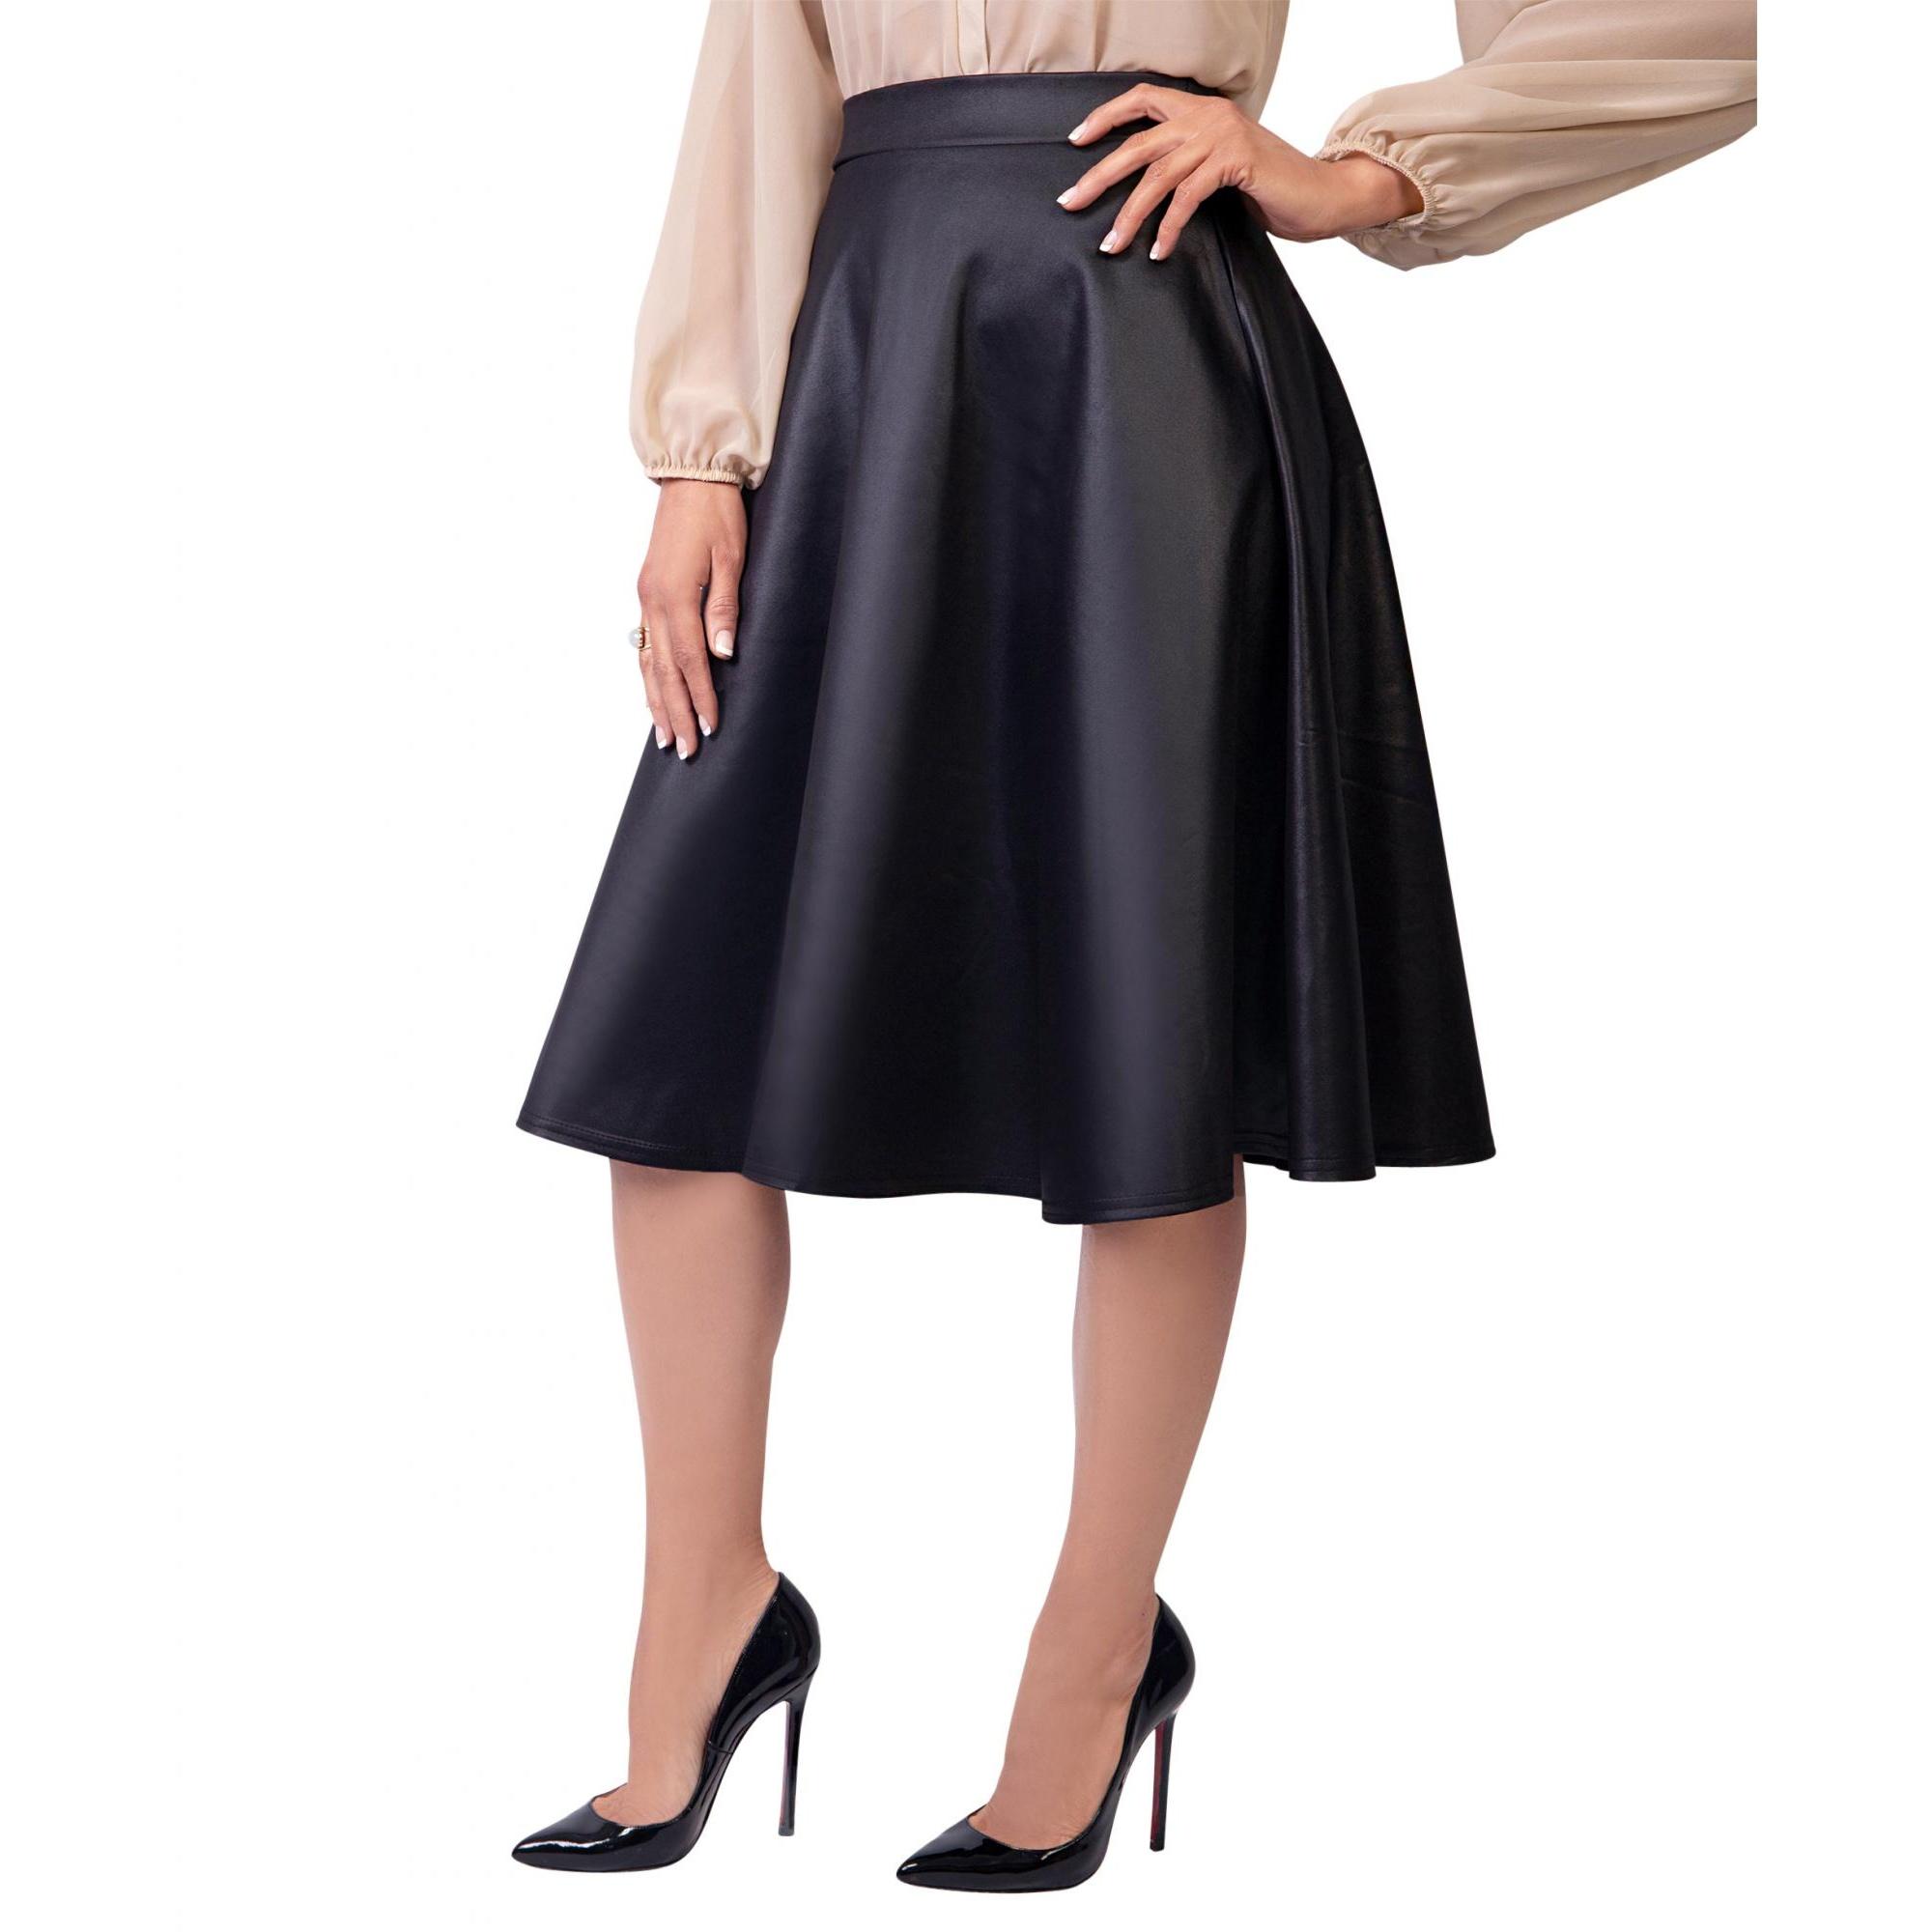 Krisp Womens/Ladies Faux Leather Midi Skirt (12 UK) (Matt Black)